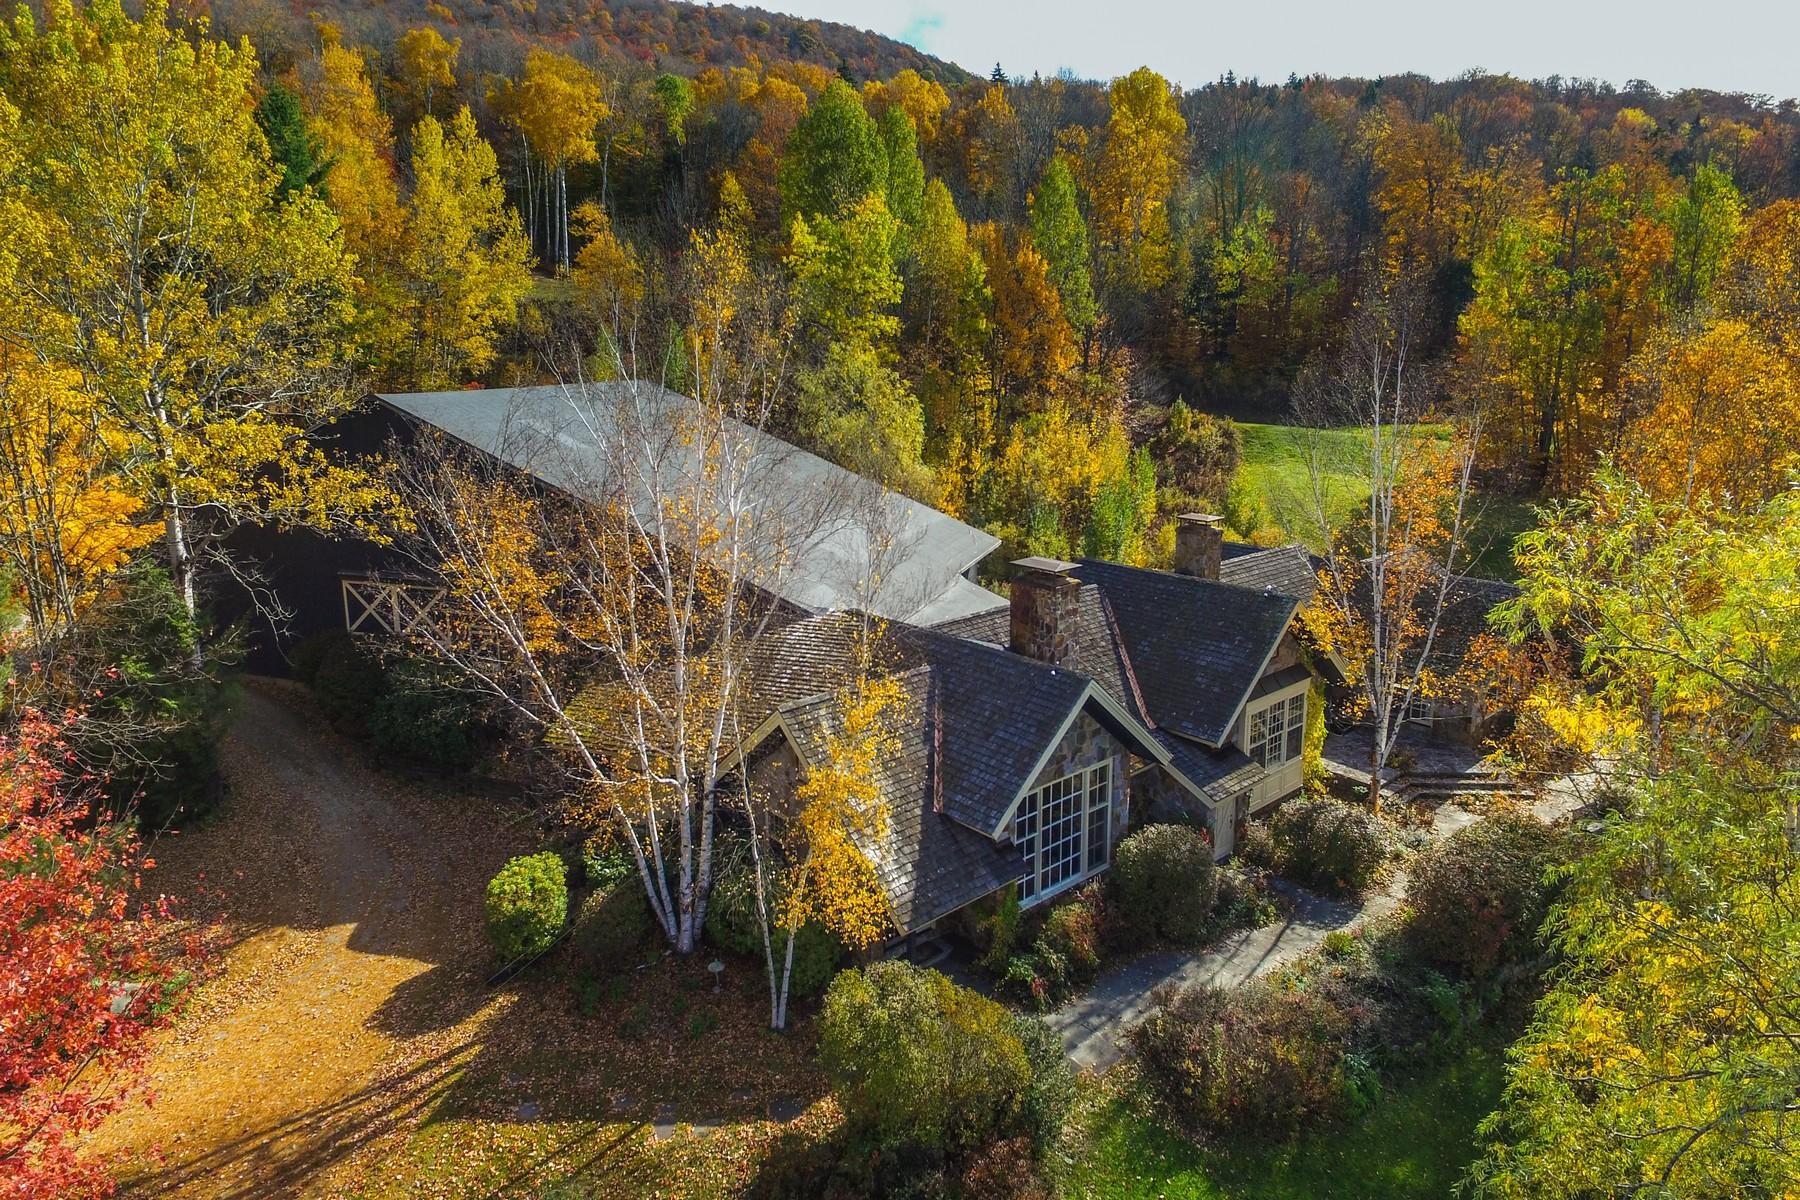 独户住宅 为 销售 在 Recreational Opportunities Abound in Custom Home 16 Someday 2, 多佛, 佛蒙特州, 05356 美国